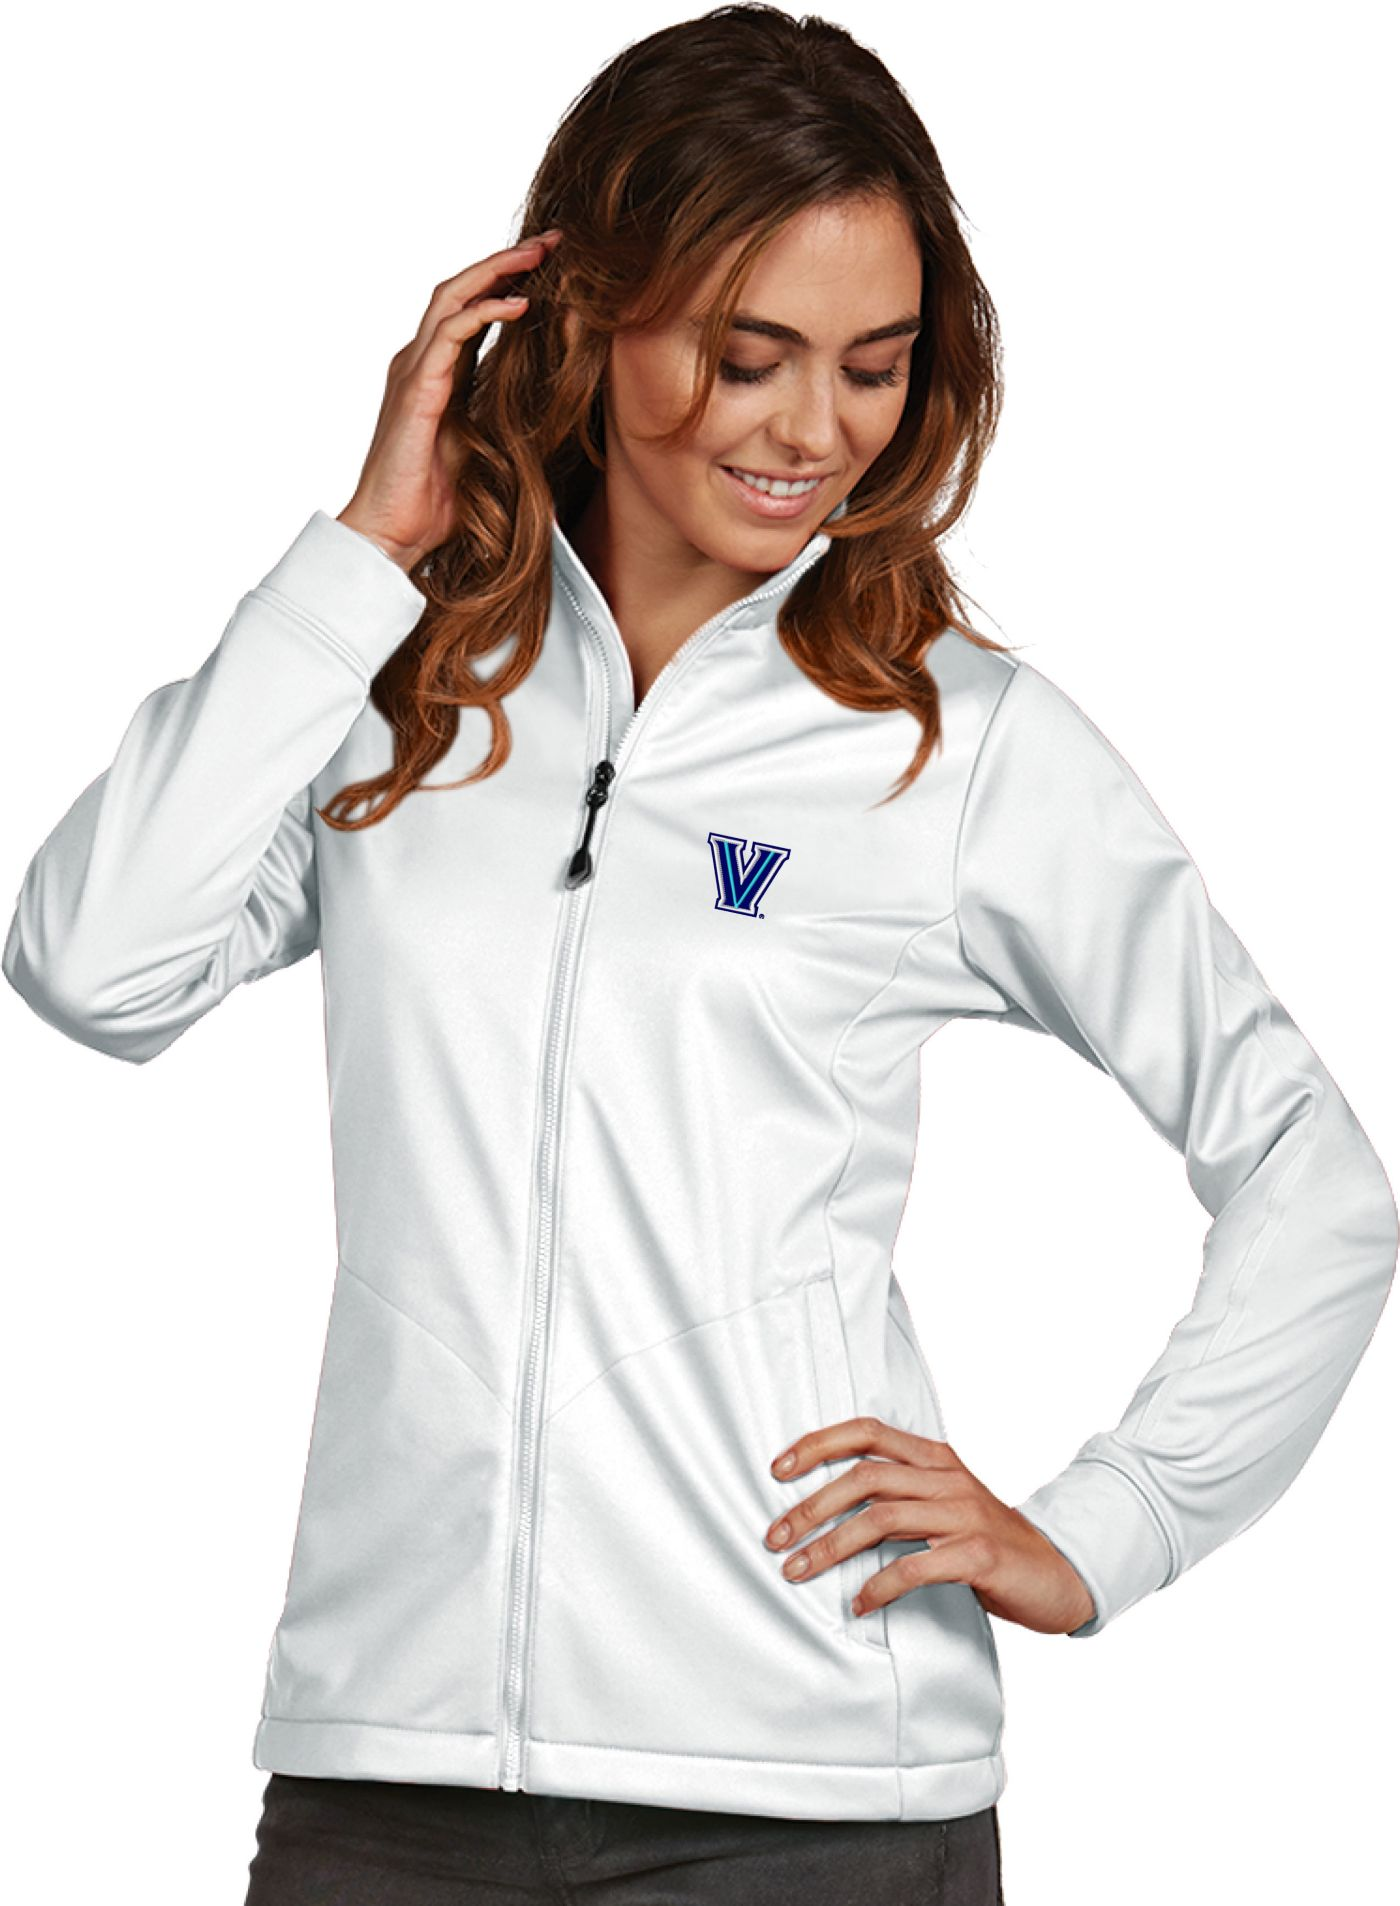 Antigua Women's Villanova Wildcats White Performance Golf Jacket